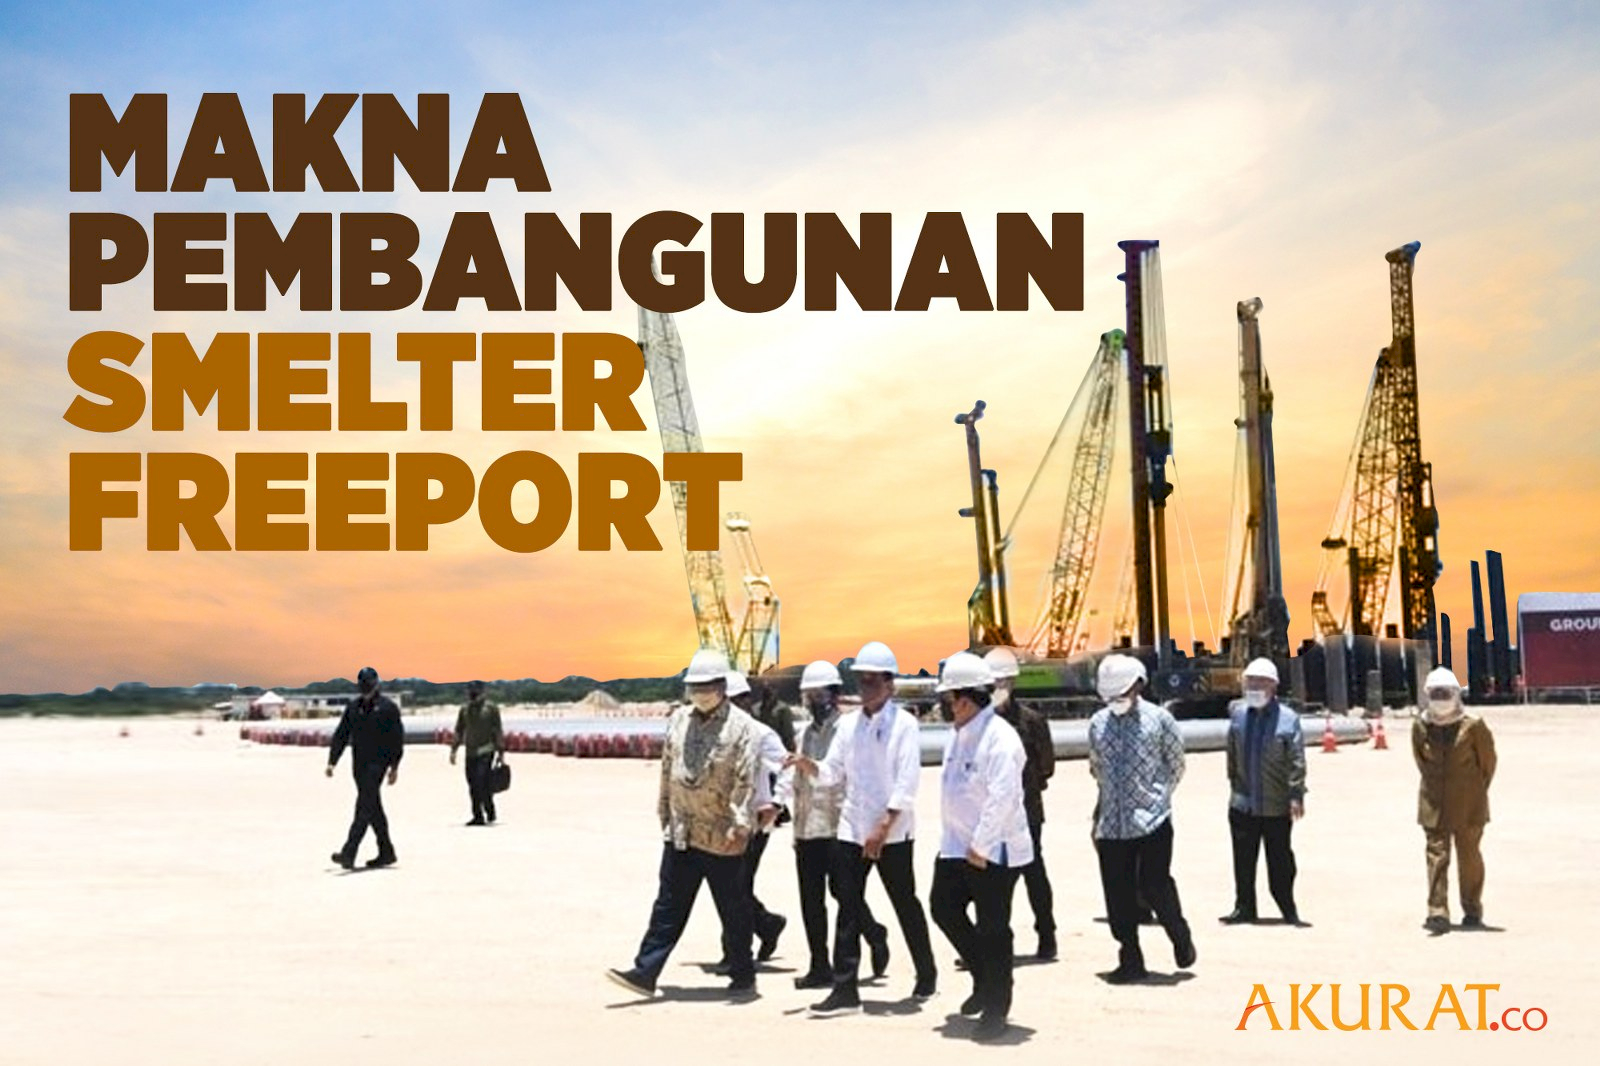 Makna Pembangunan Smelter Freeport